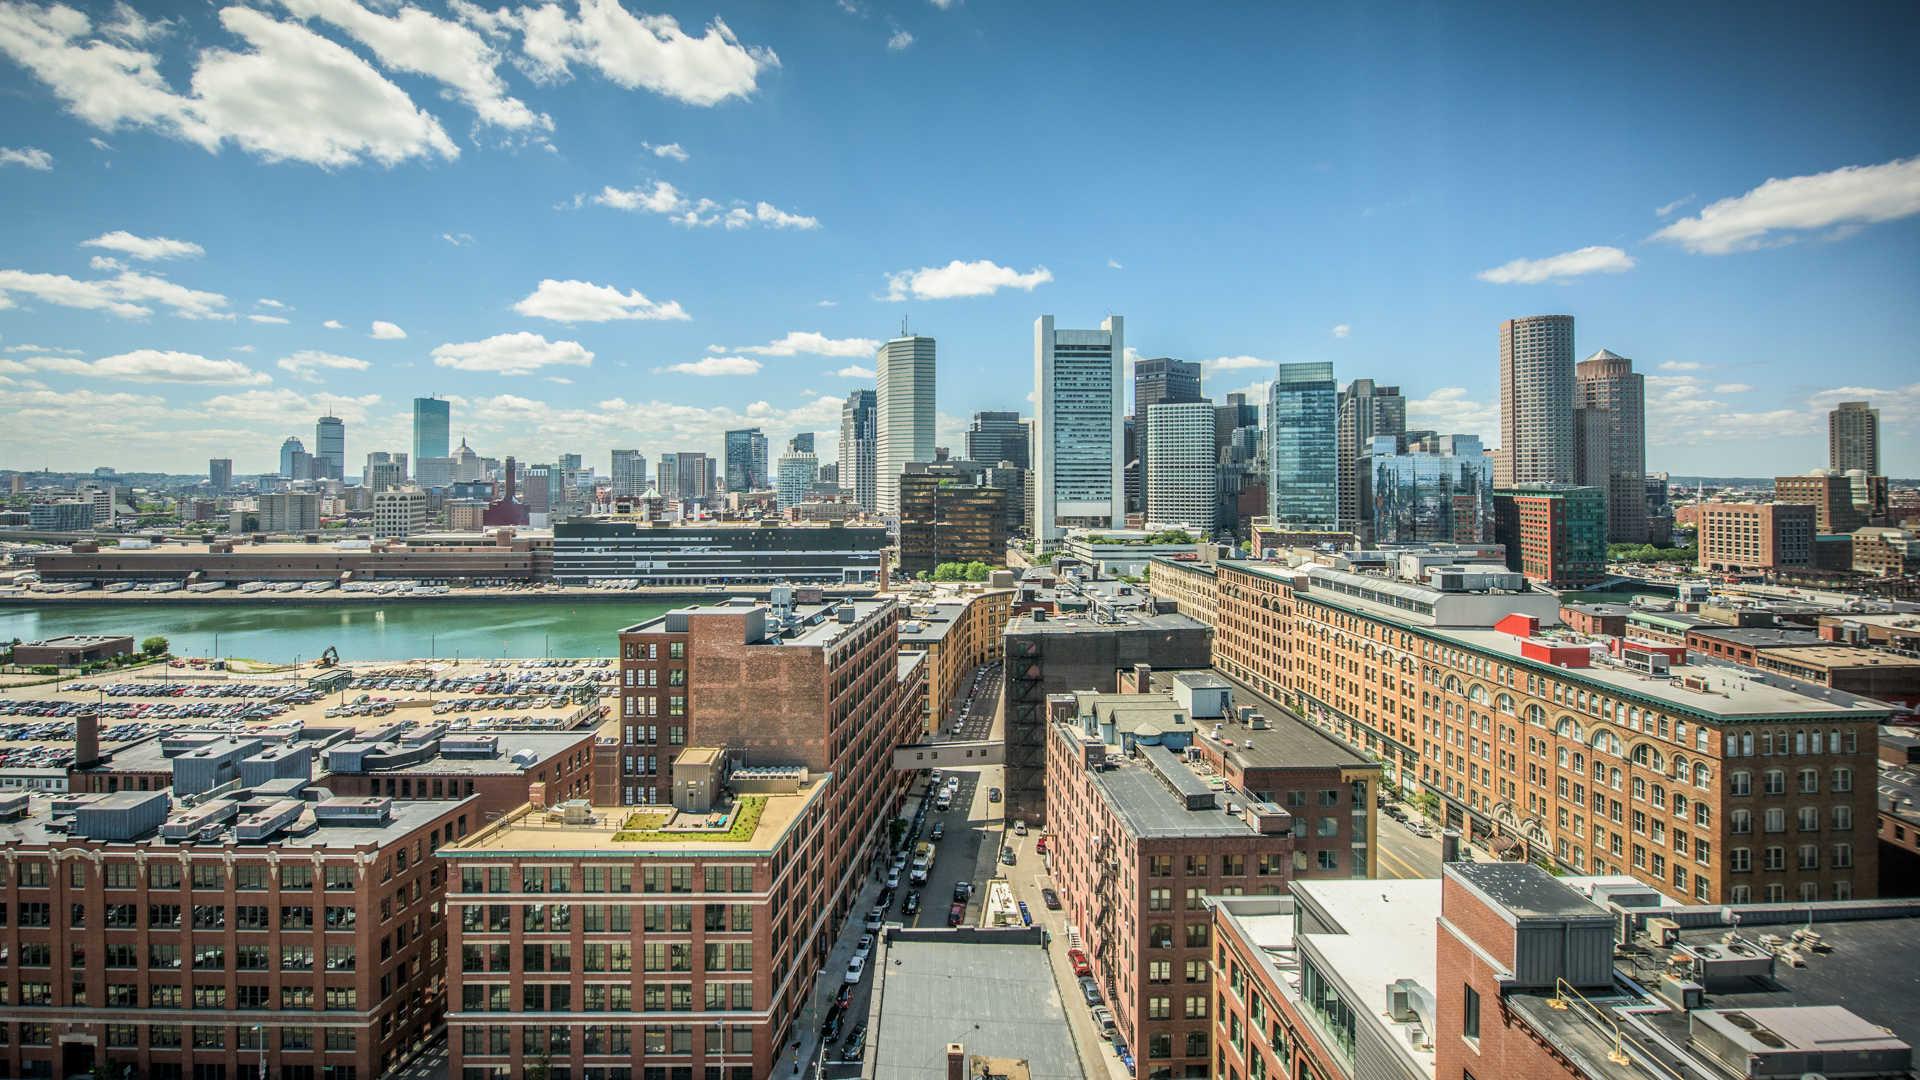 A picture of Boston